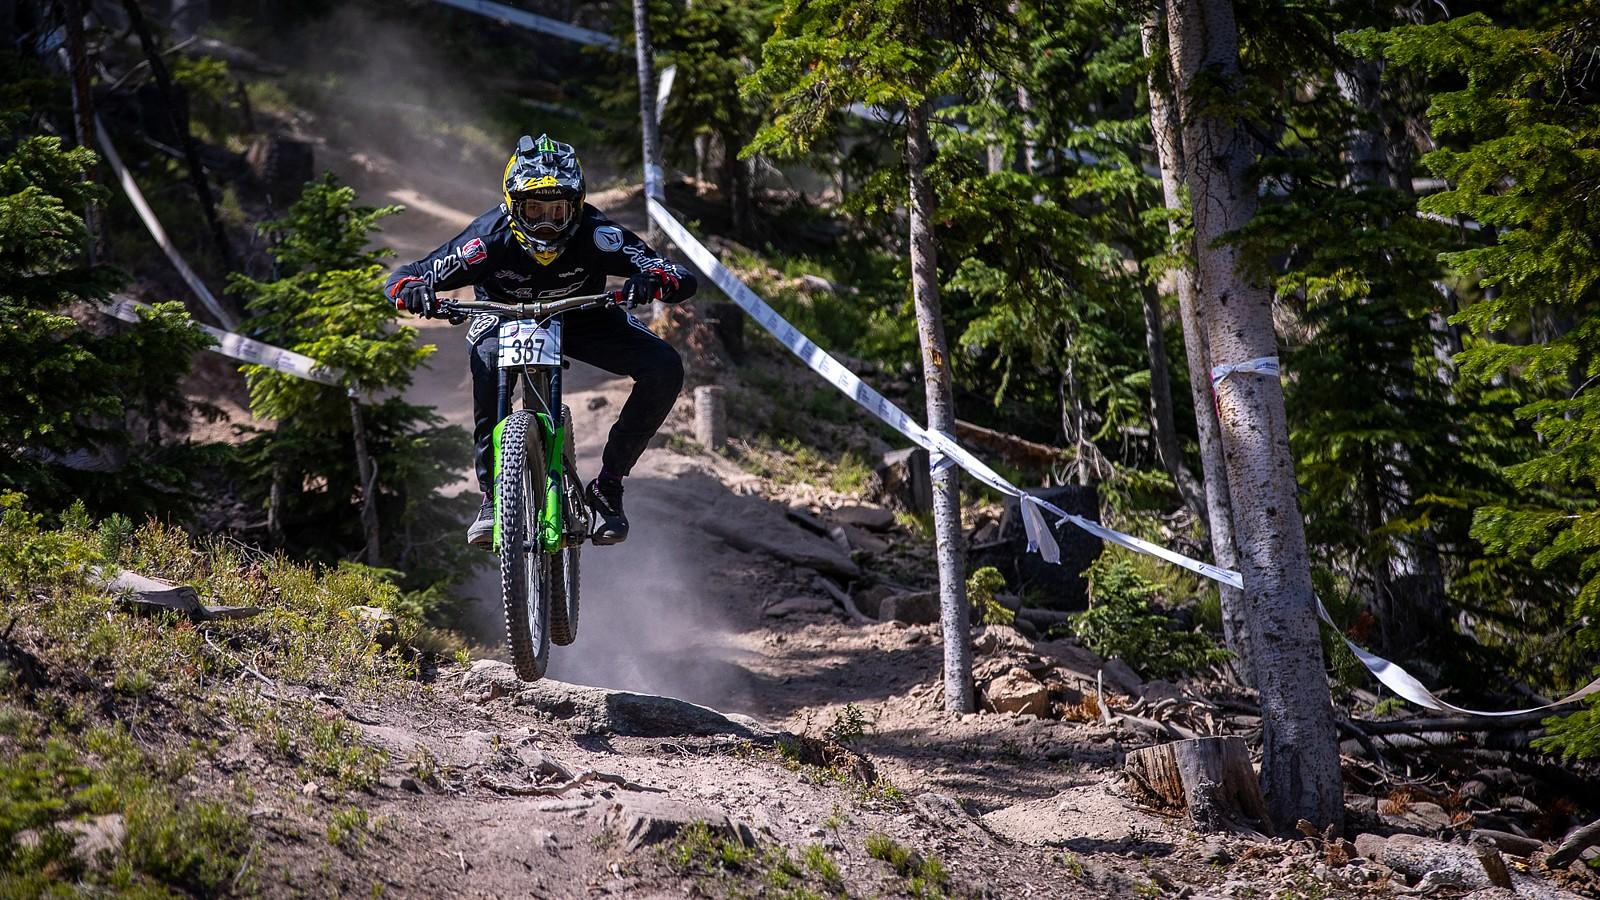 Ryan Pinkerton Men's Jr 15-16 Champ - US National Champs Downhill Photo Blast - Mountain Biking Pictures - Vital MTB